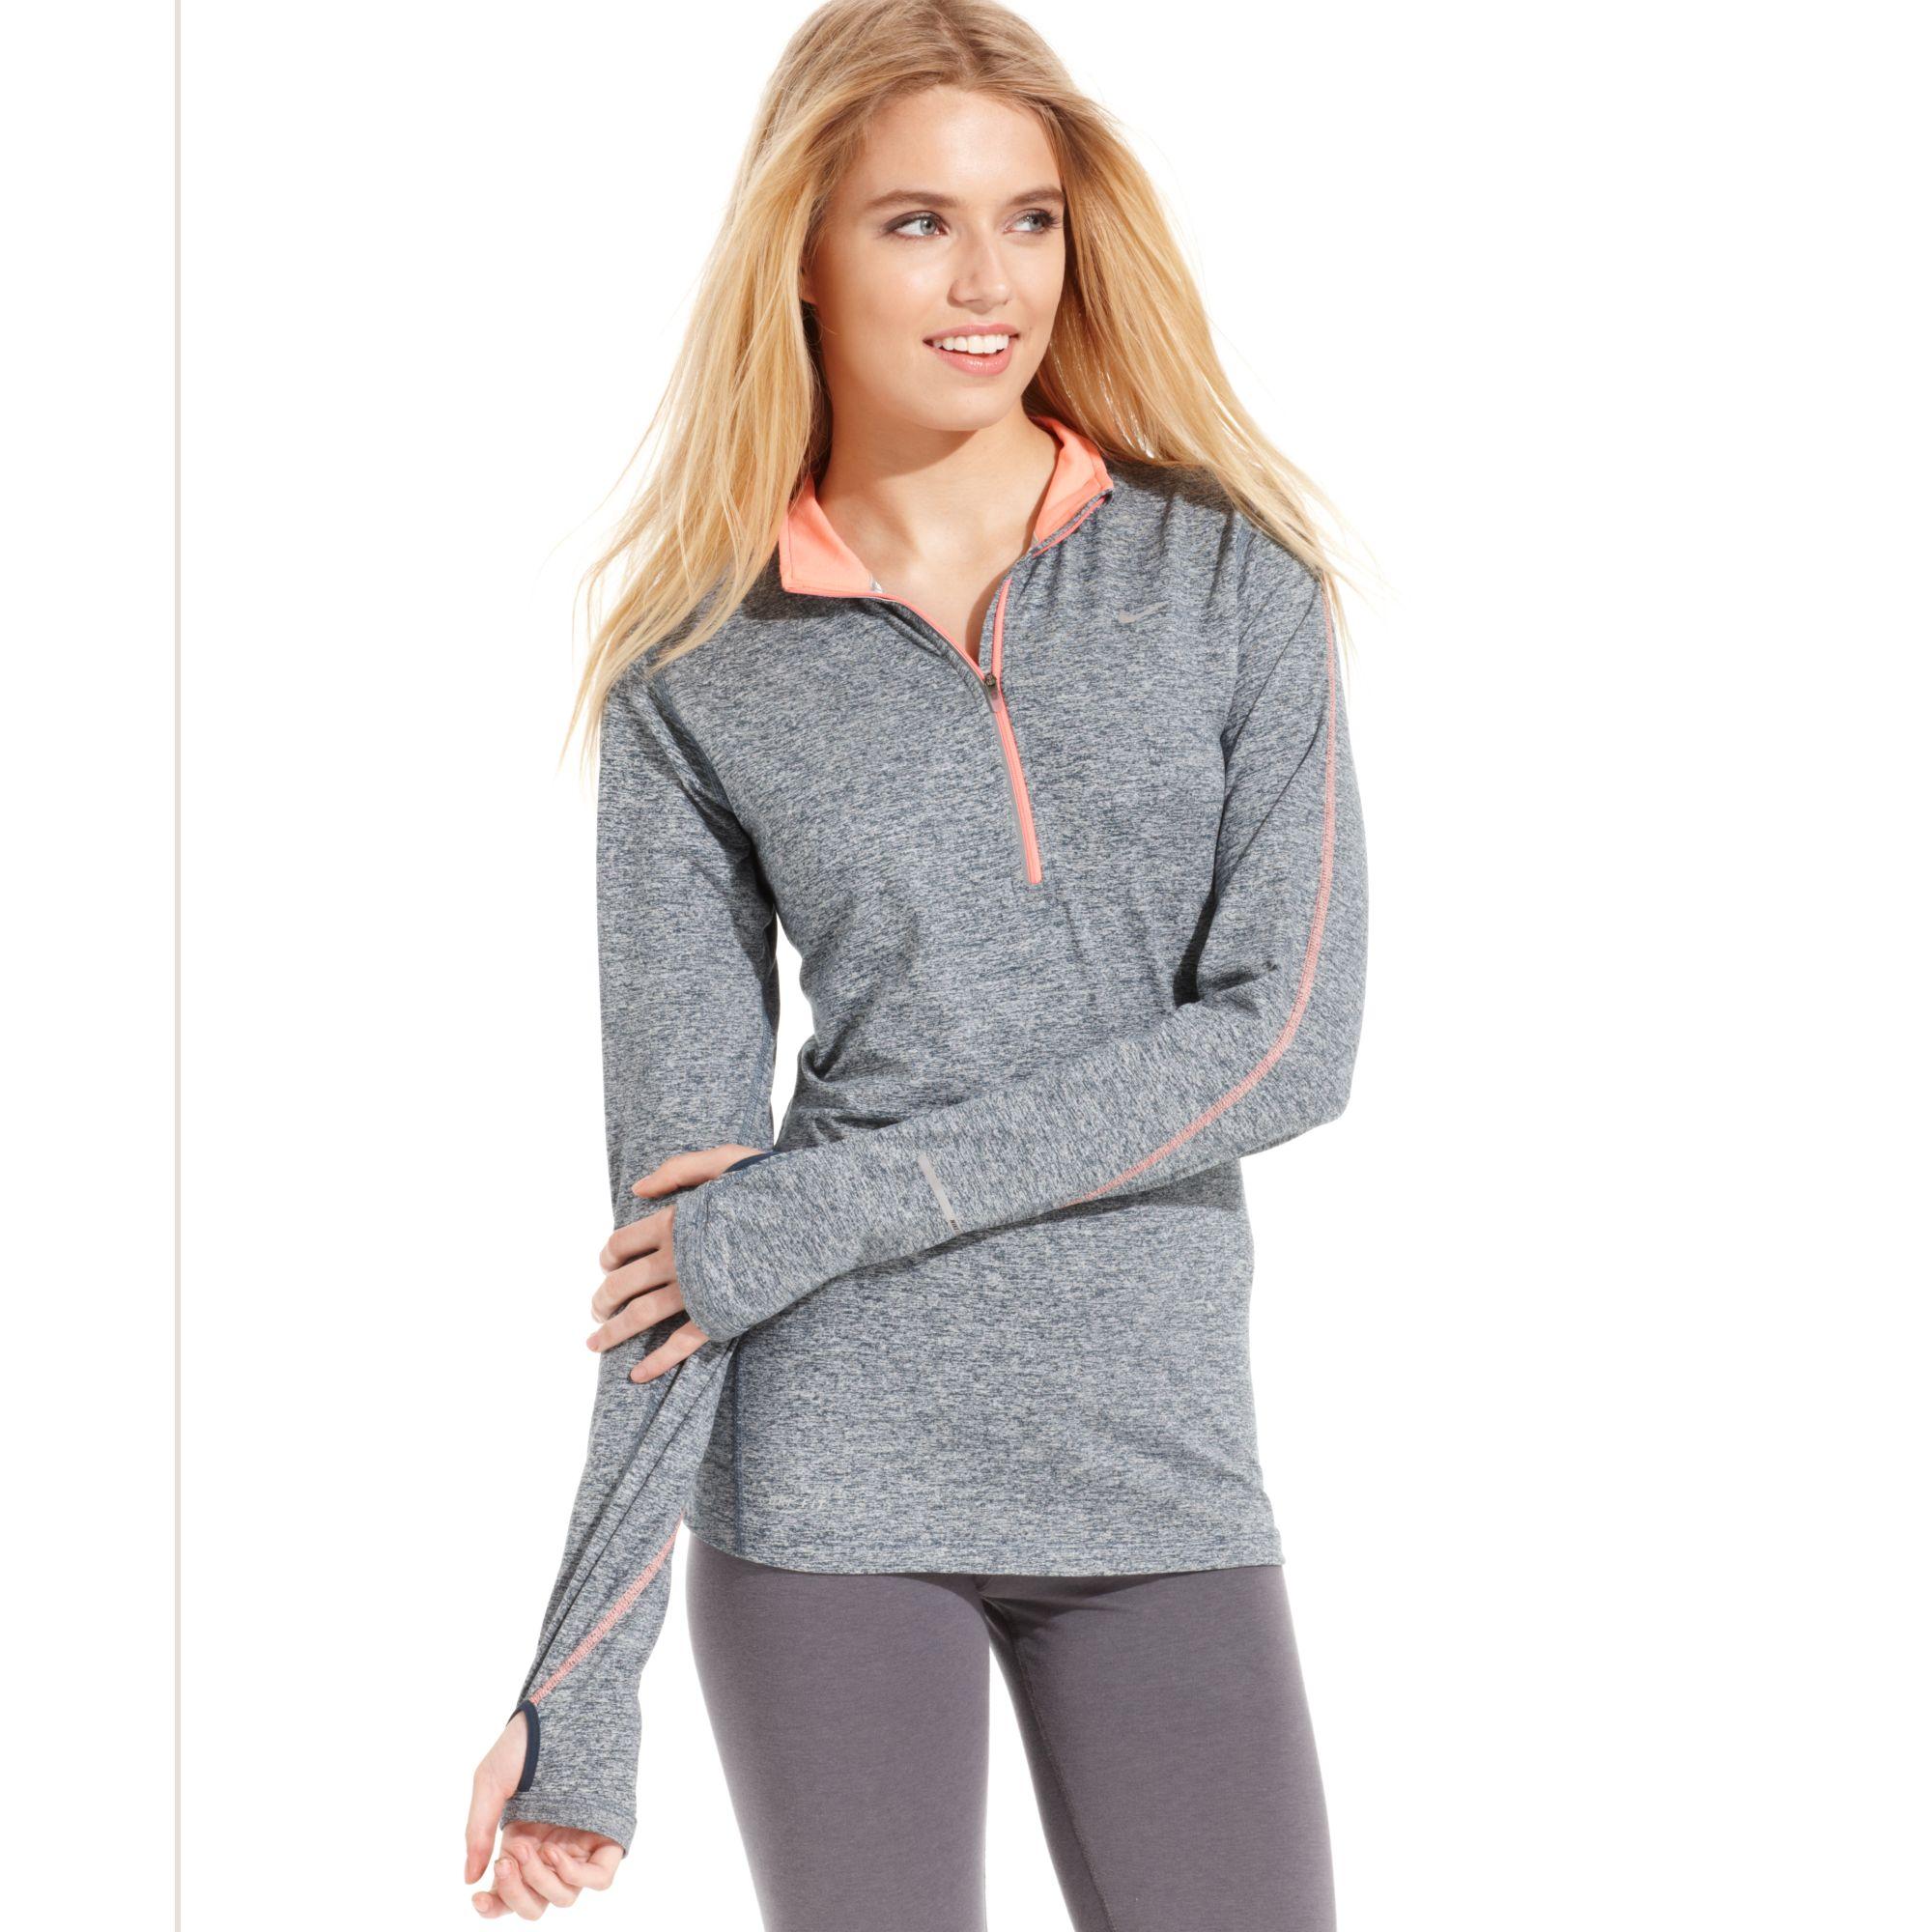 Nike Element Longsleeve Drifit Halfzip Pullover In Gray